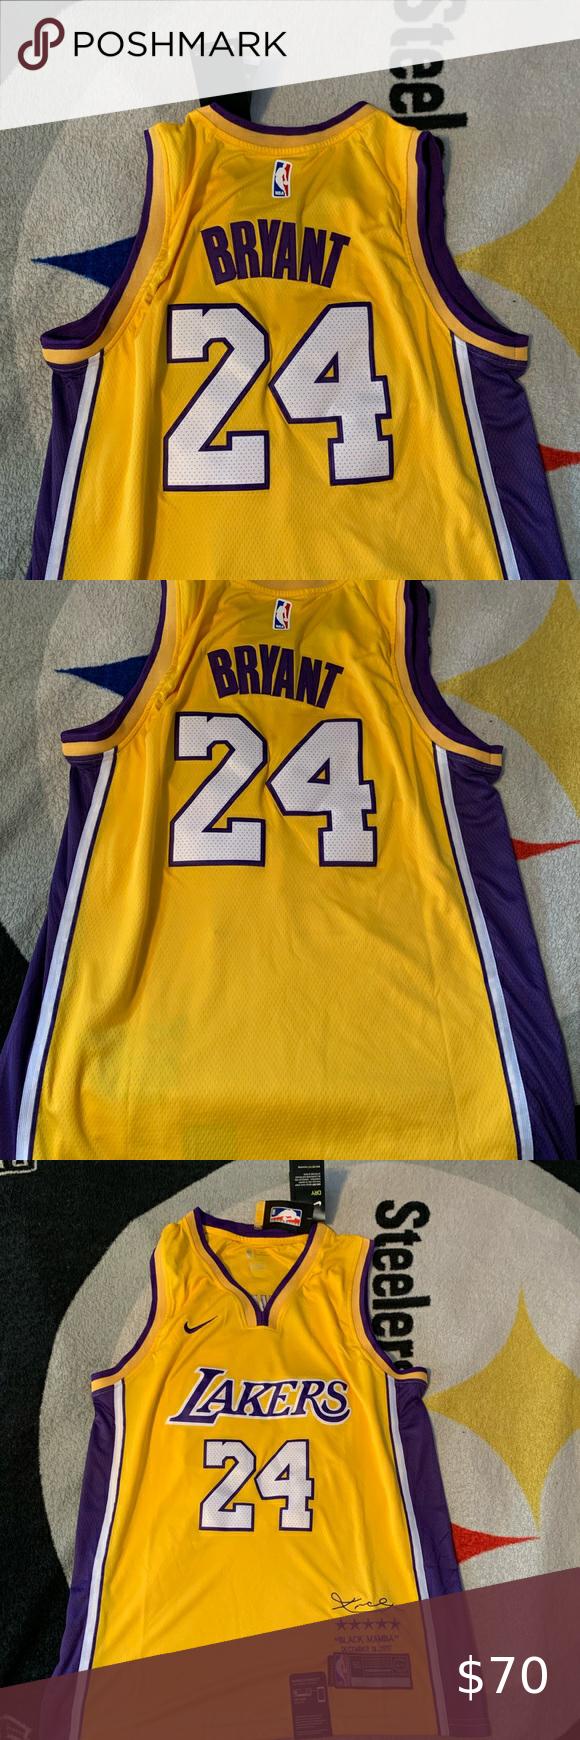 Kobe Bryant 24 Lakers Black Mamba Jersey In 2020 Kobe Bryant Kobe Bryant 24 Kobe Bryant Black Mamba